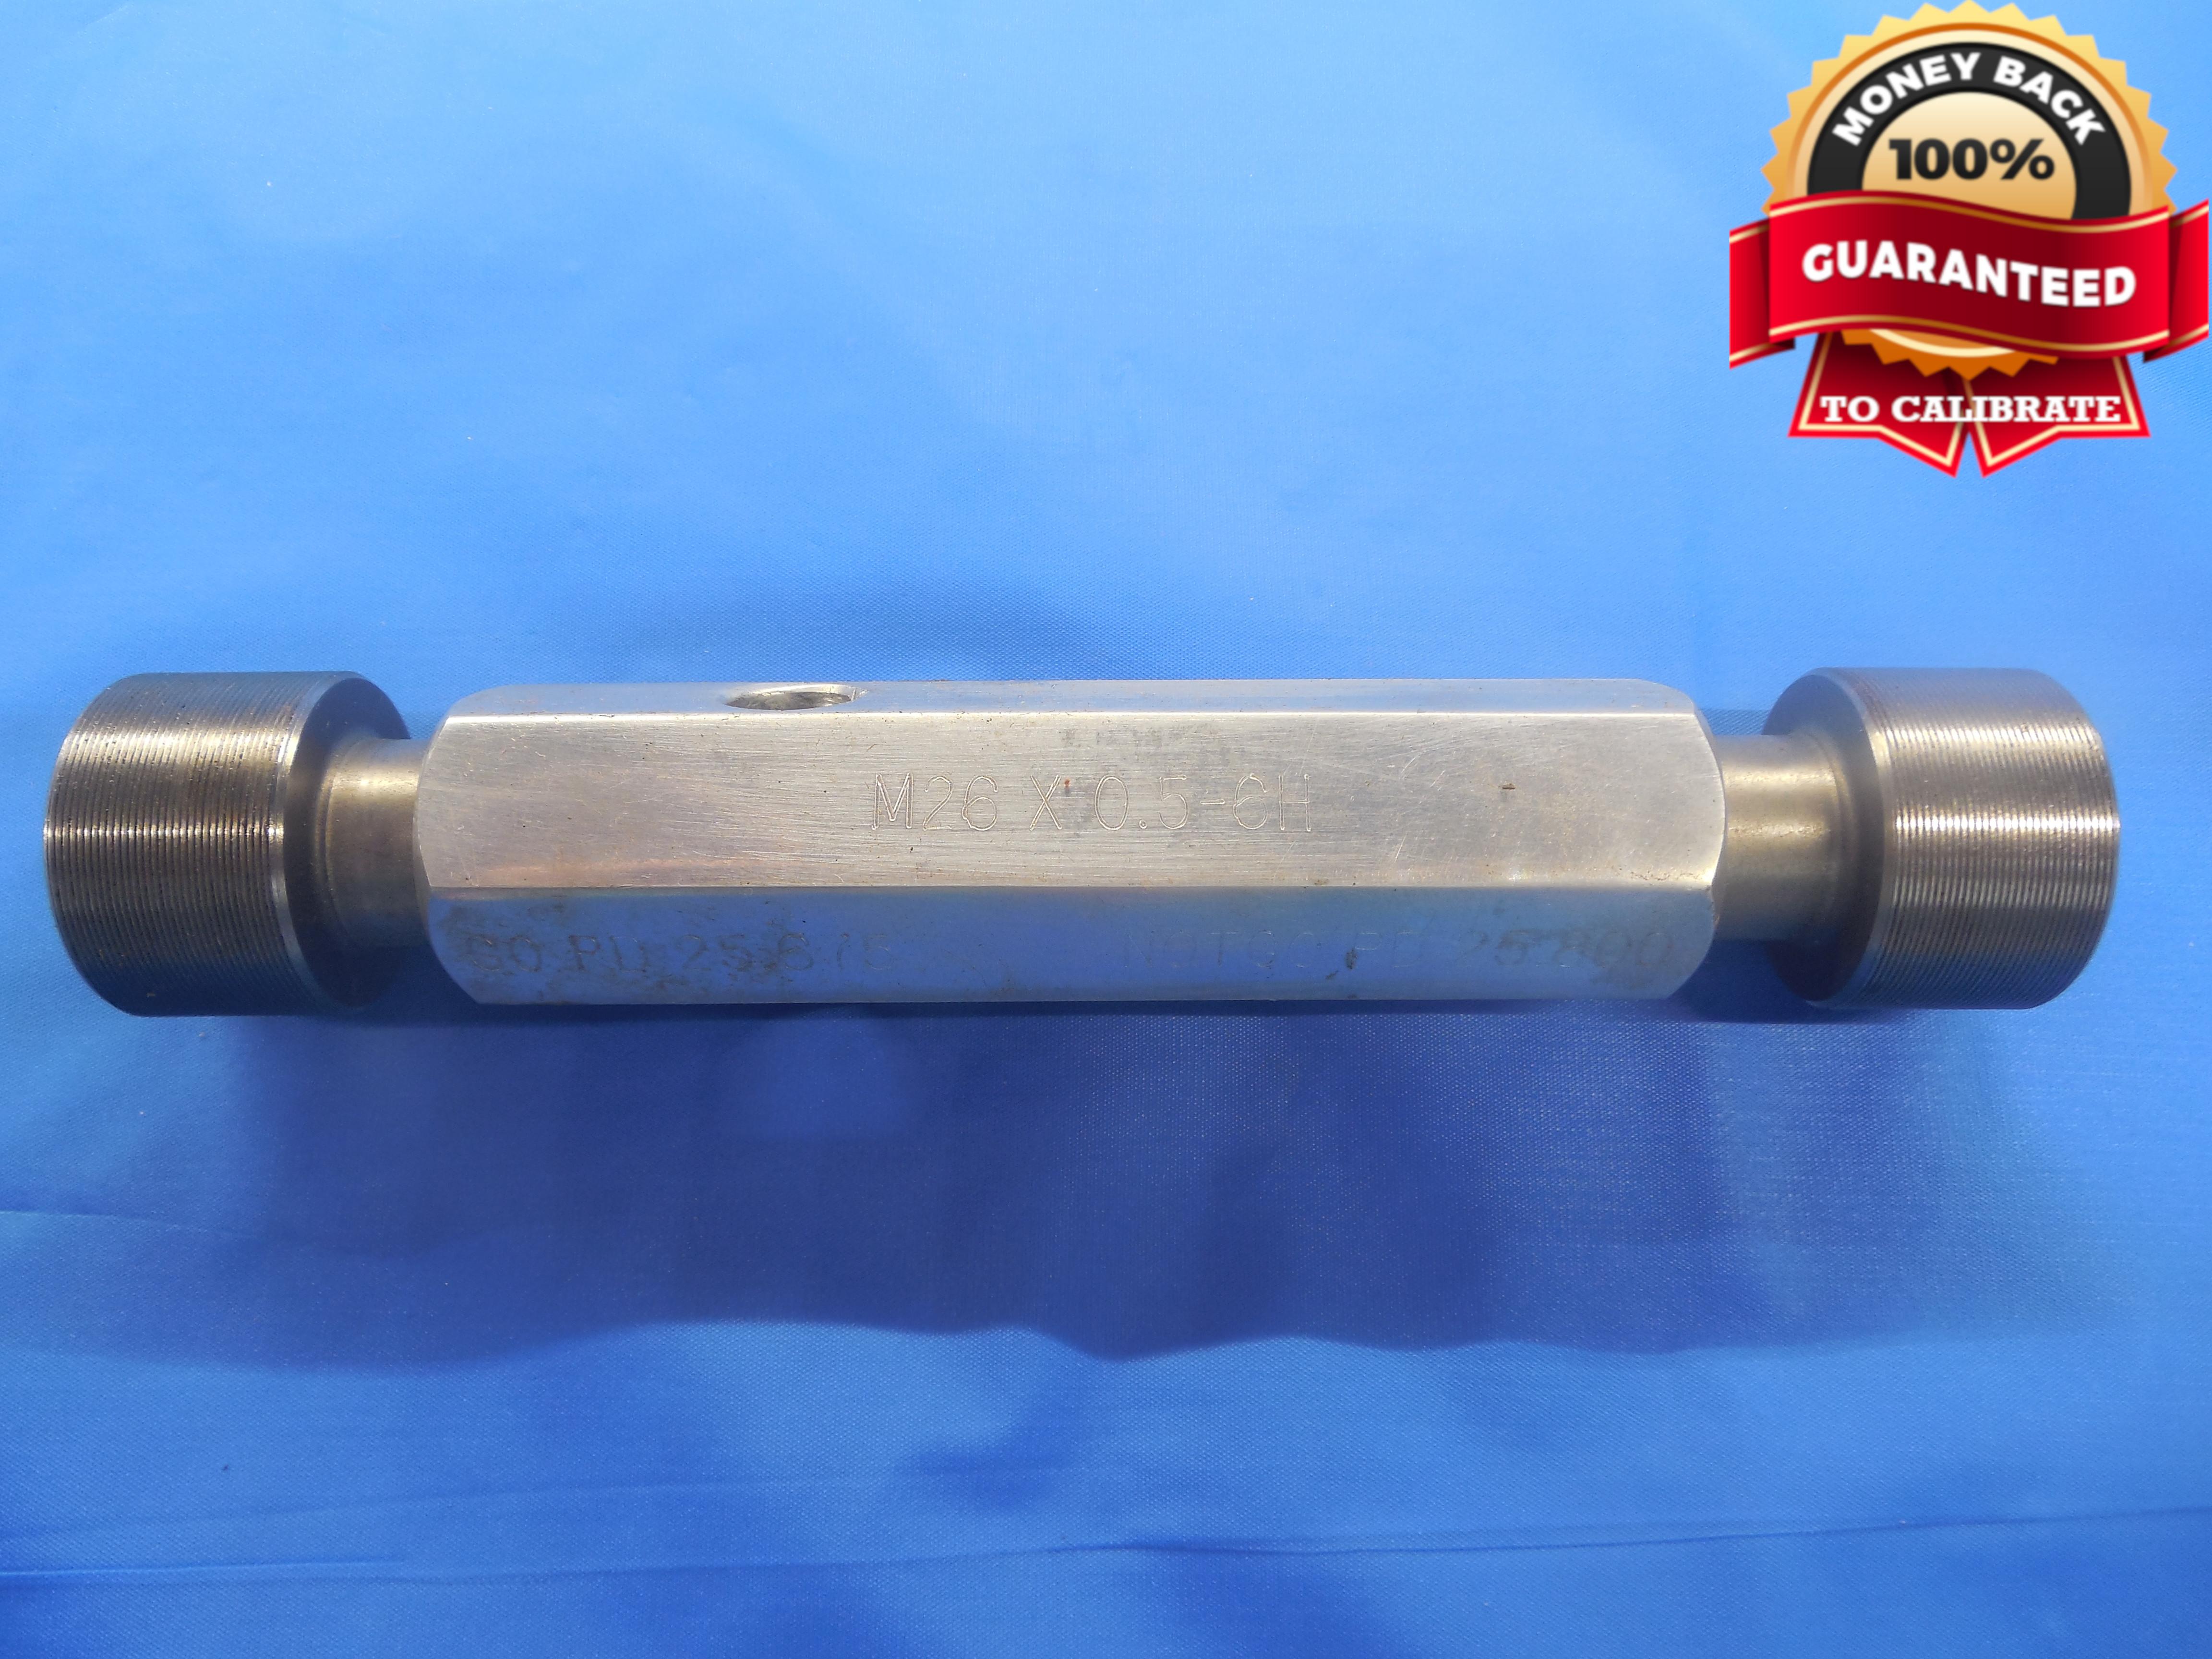 M35 x 1.5 Metric Right Hand Thread Ring Gage Set